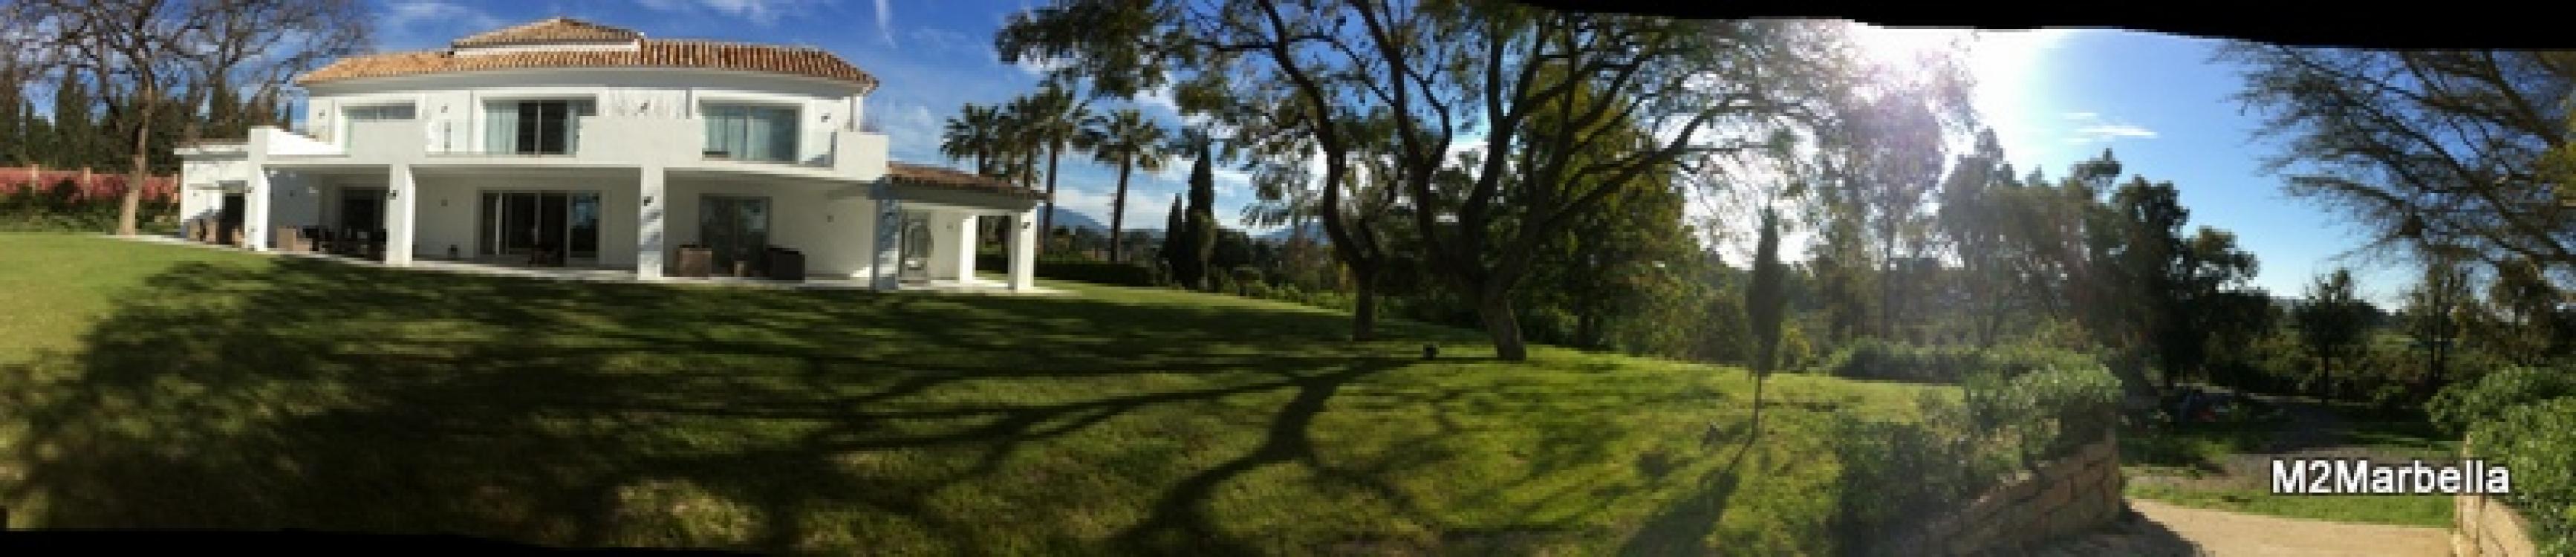 Inmobiliaria m2 marbella for Villa jardin lanus oeste